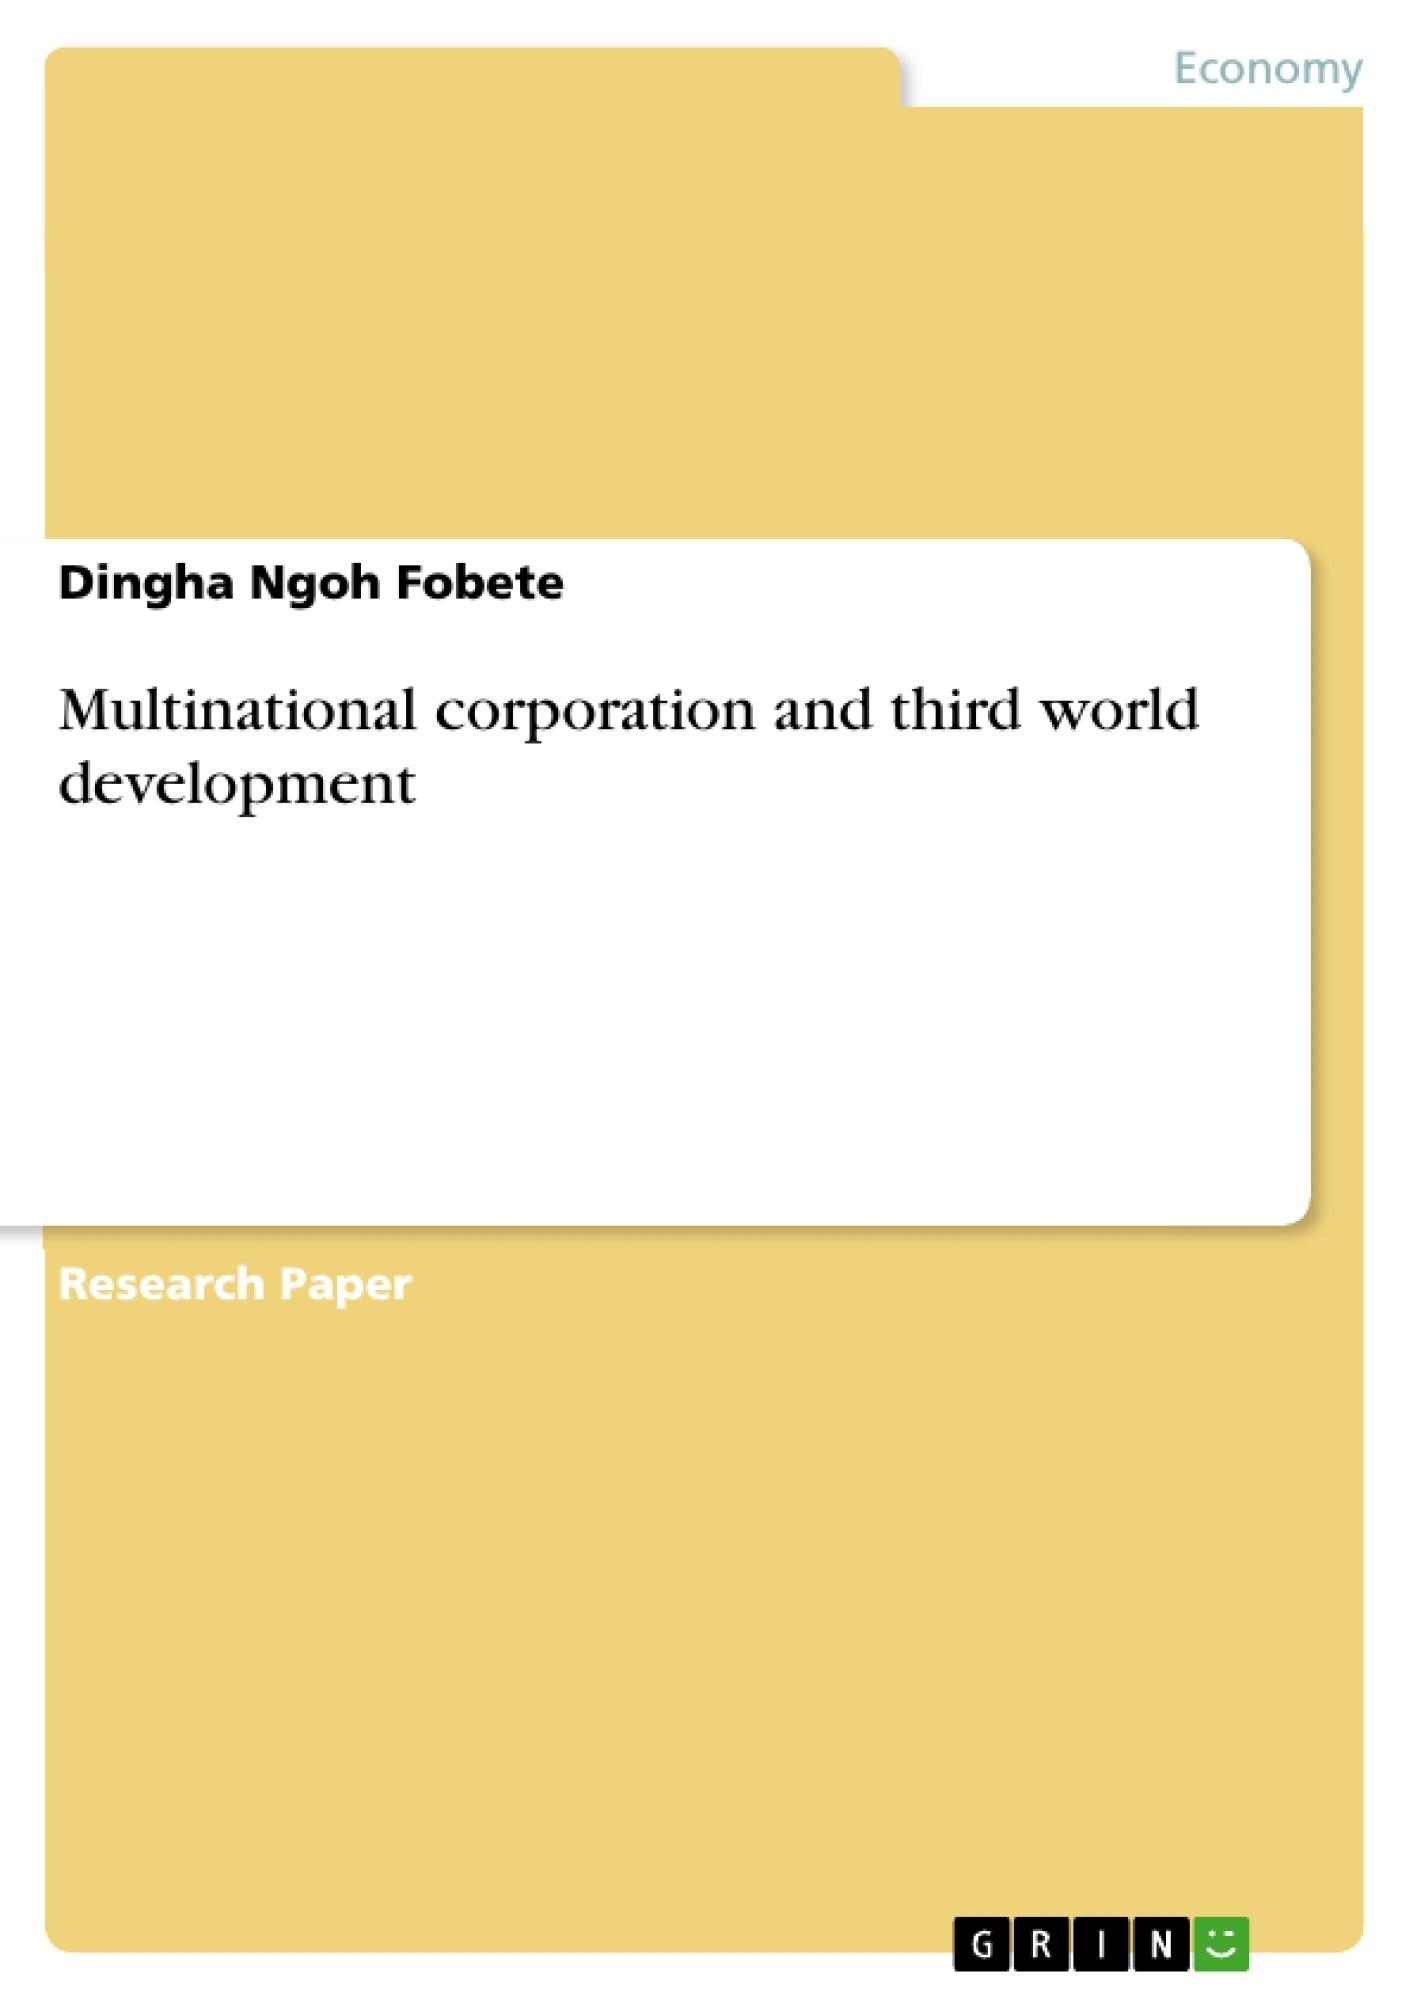 Title: Multinational corporation and third world development